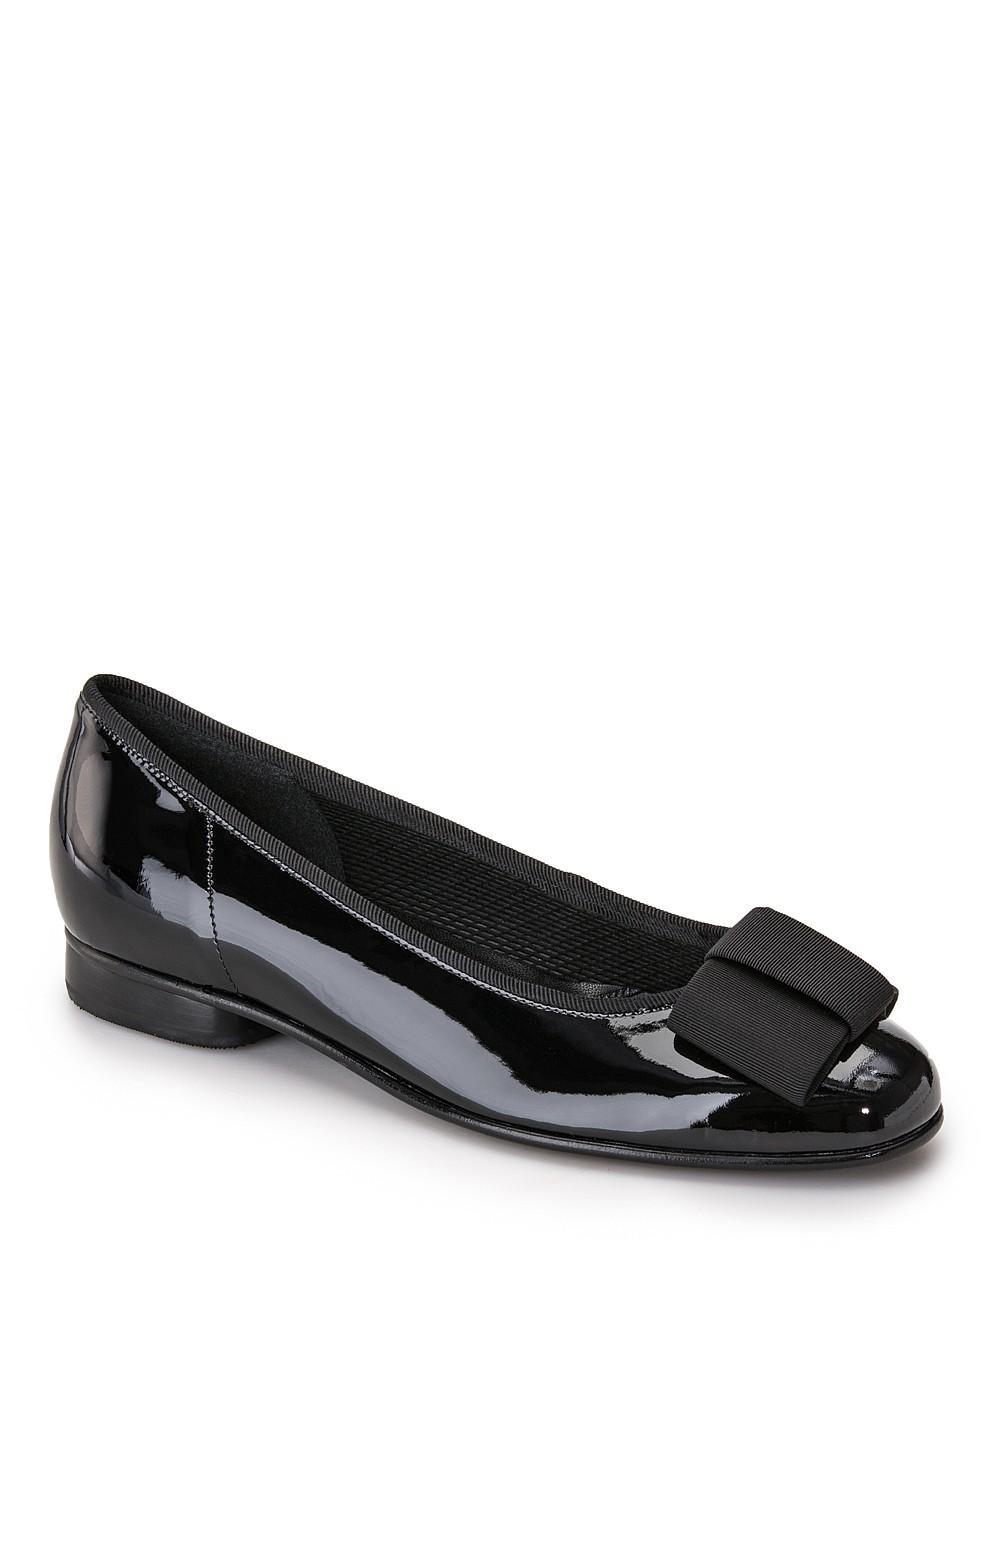 b885b9dc90ecc Gabor Petersham Bow Pump | Ladies Evening/Dress Shoes | House Of Bruar